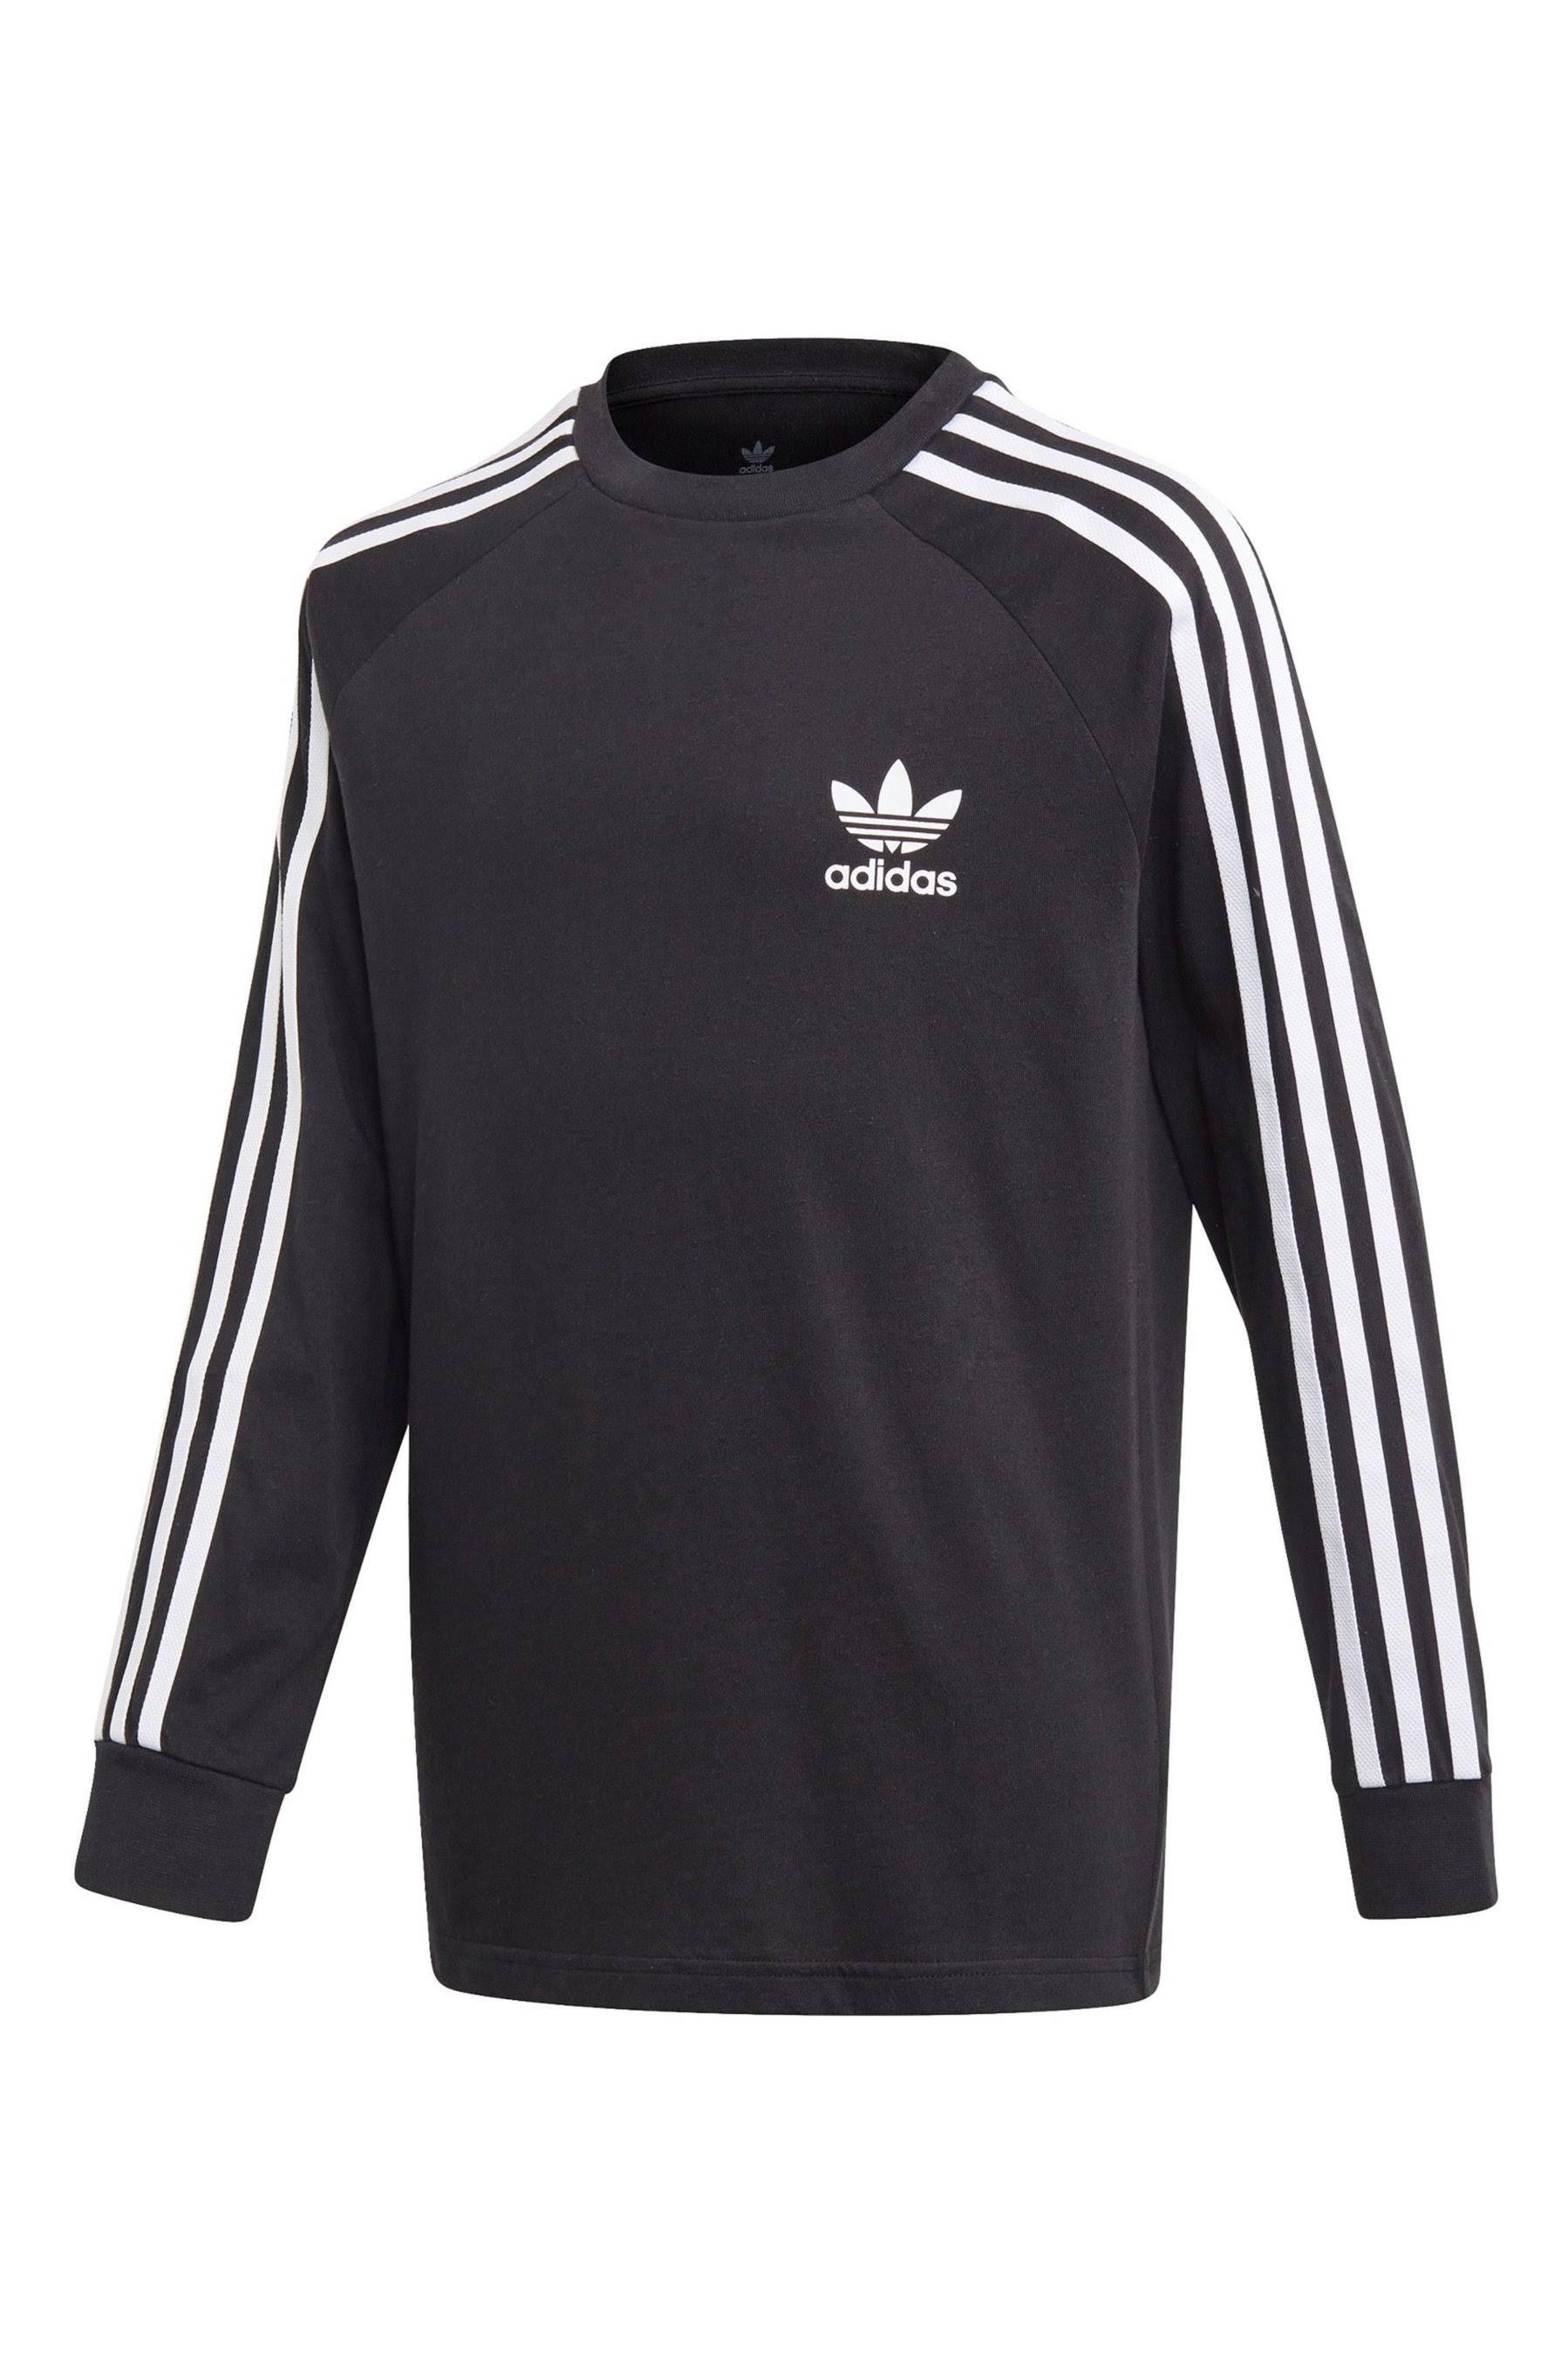 Adidas 3-Stripes Long-Sleeve Top - Black - Kids